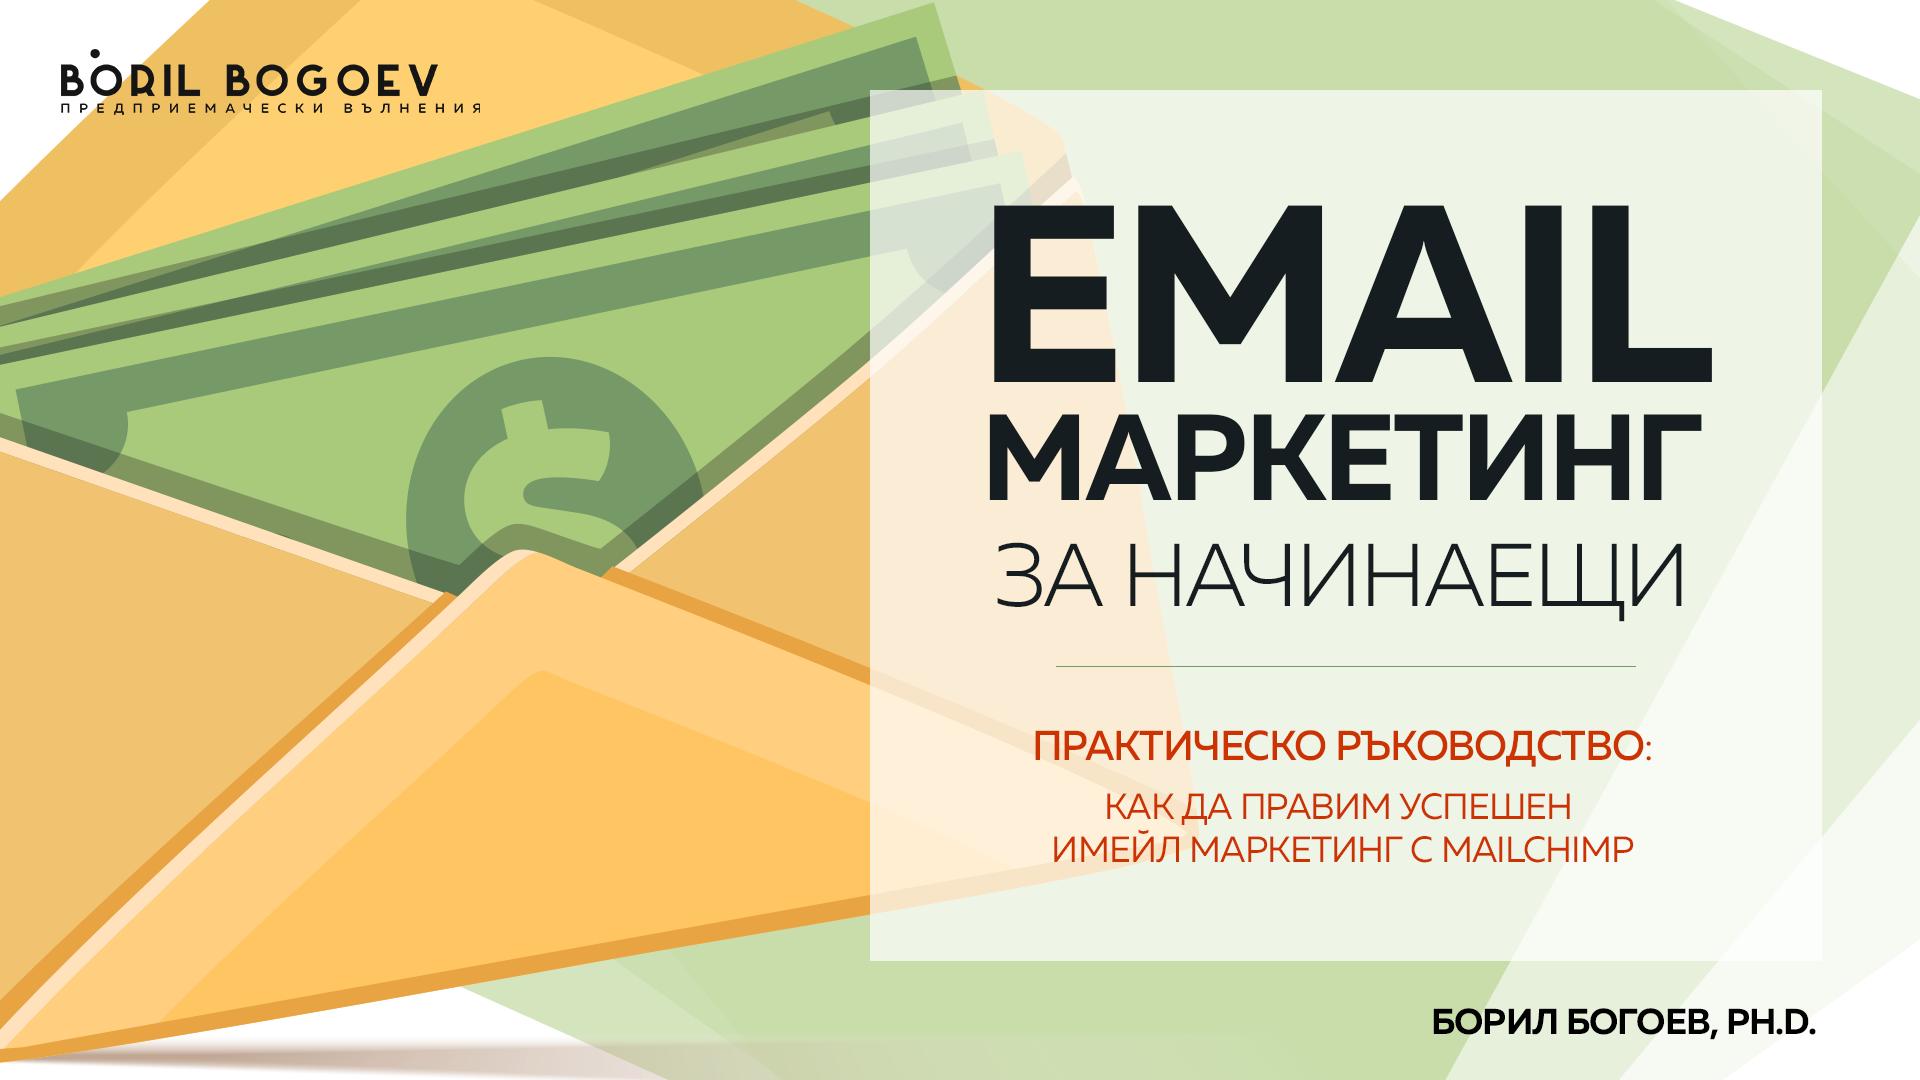 emb-presentation-title